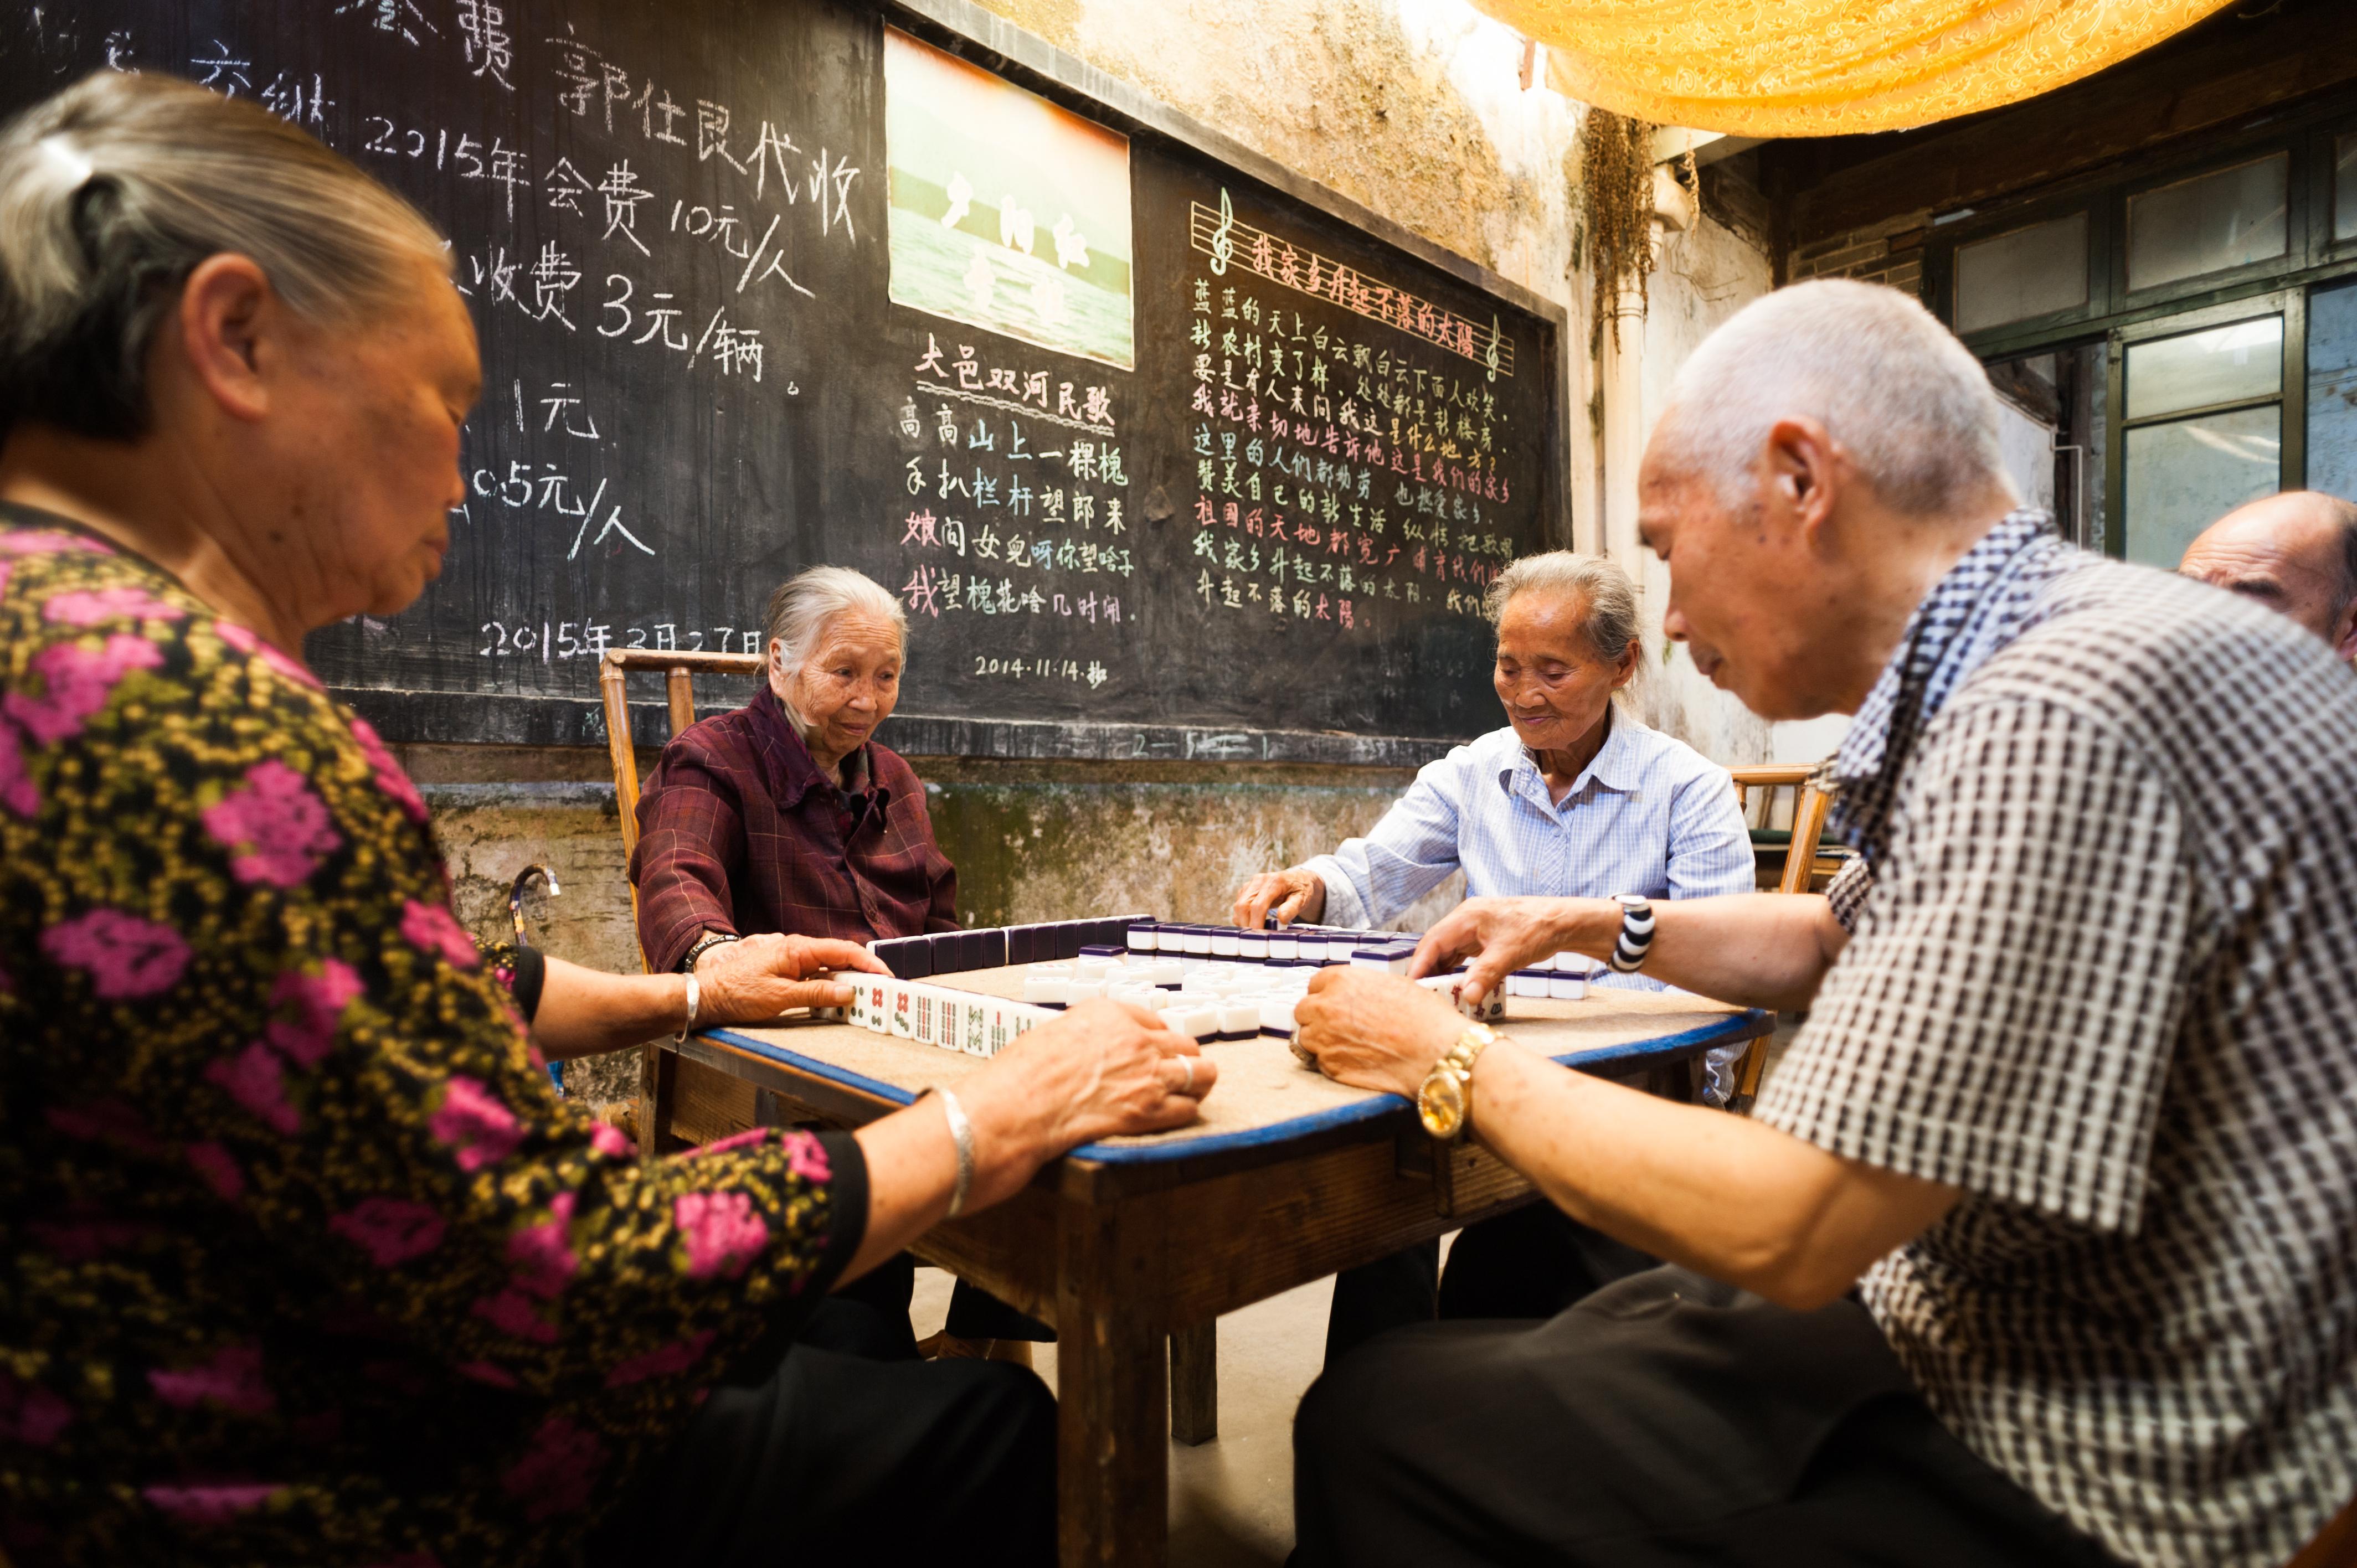 Elderly Report - Collective Responsibility